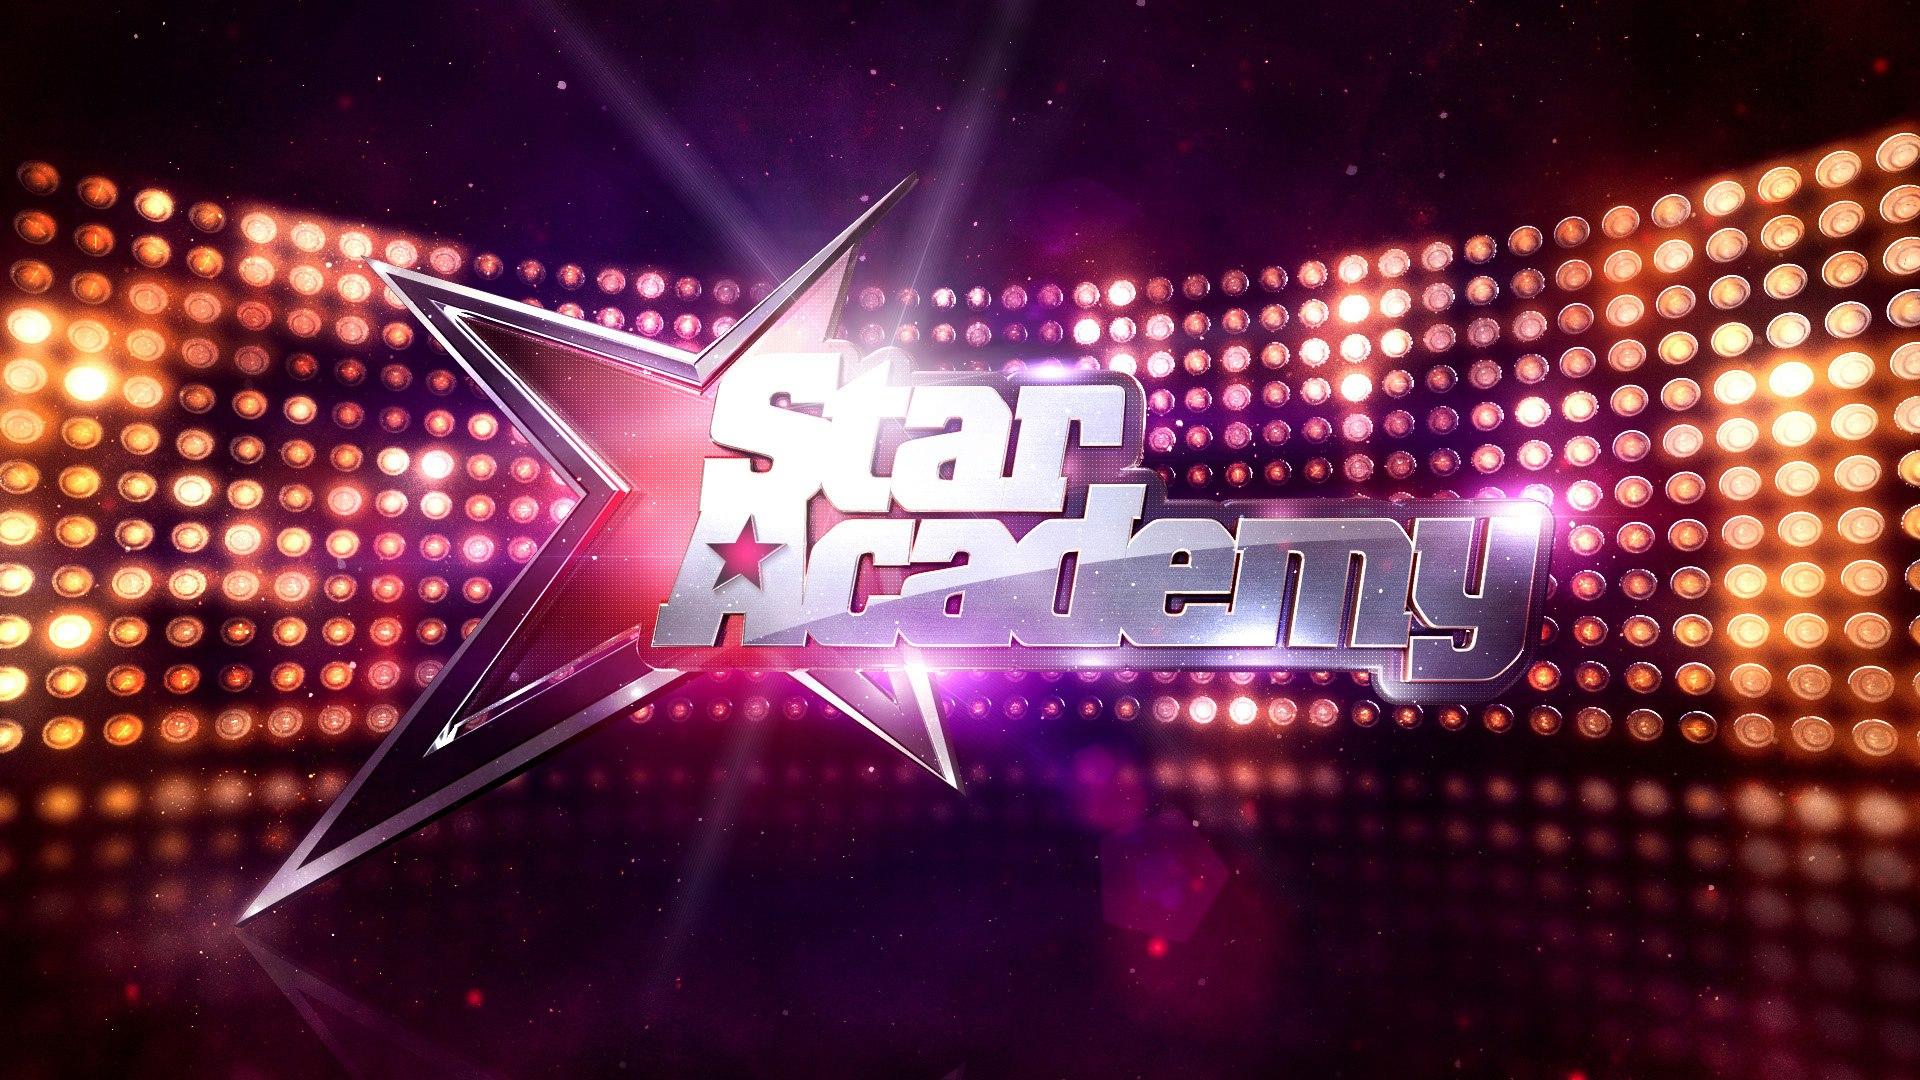 Star_Academy_12_nrj12